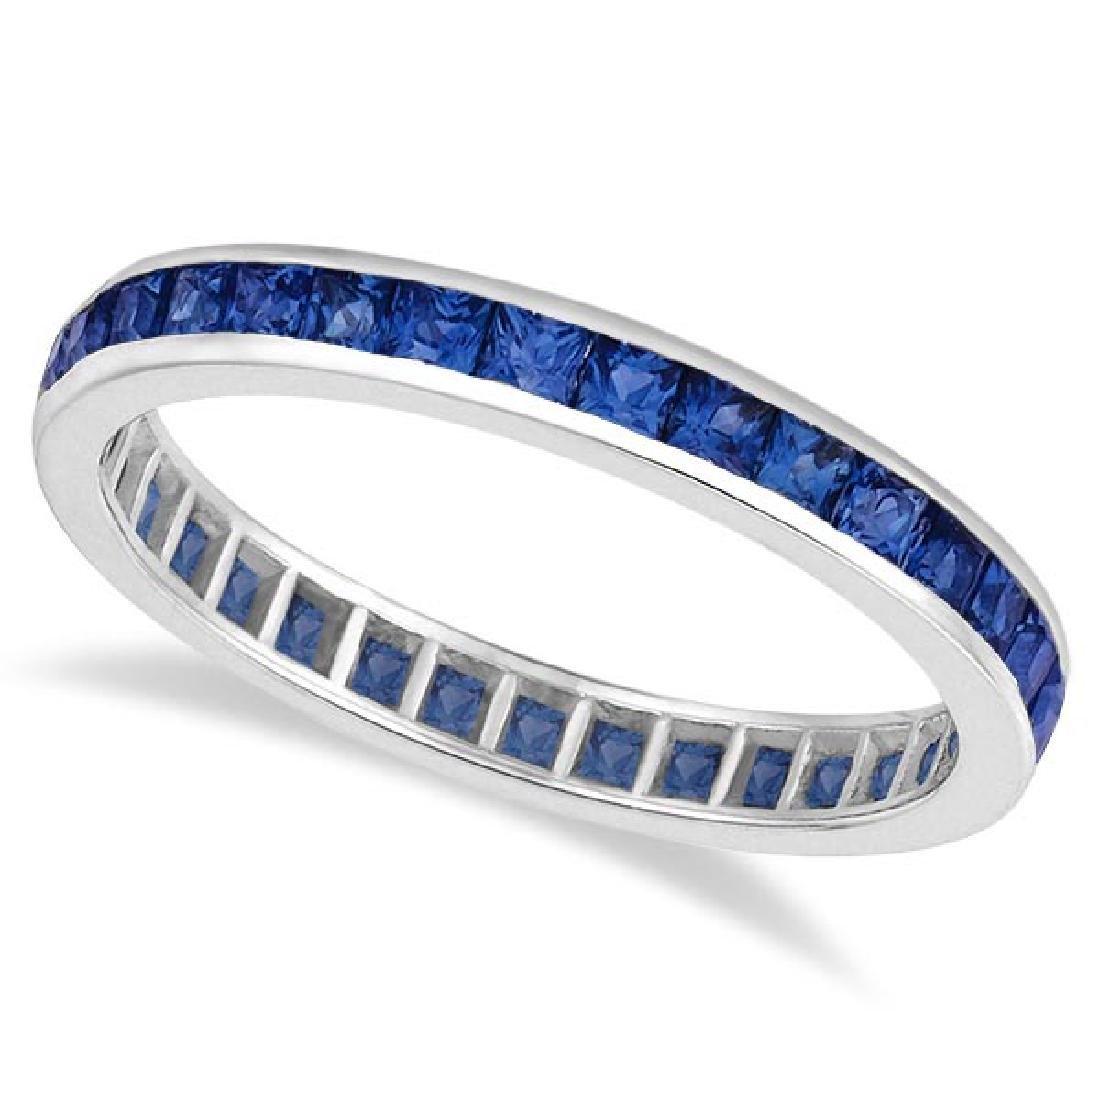 Princess-Cut Blue Sapphire Eternity Ring Band 14k White